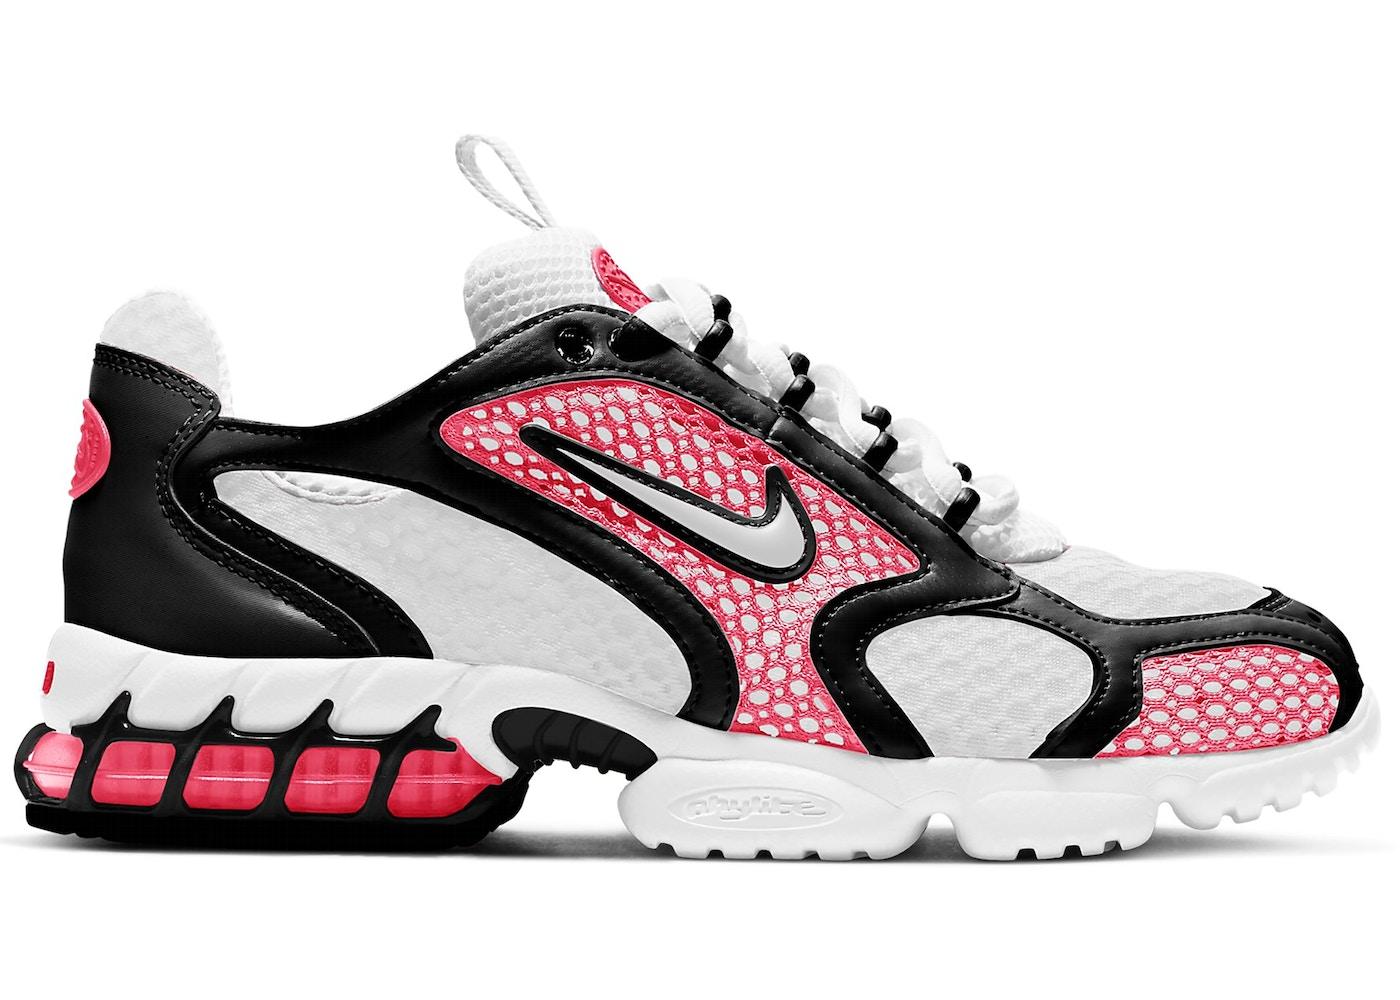 Nike Air Zoom Spiridon Cage 2 Flash Crimson (W)